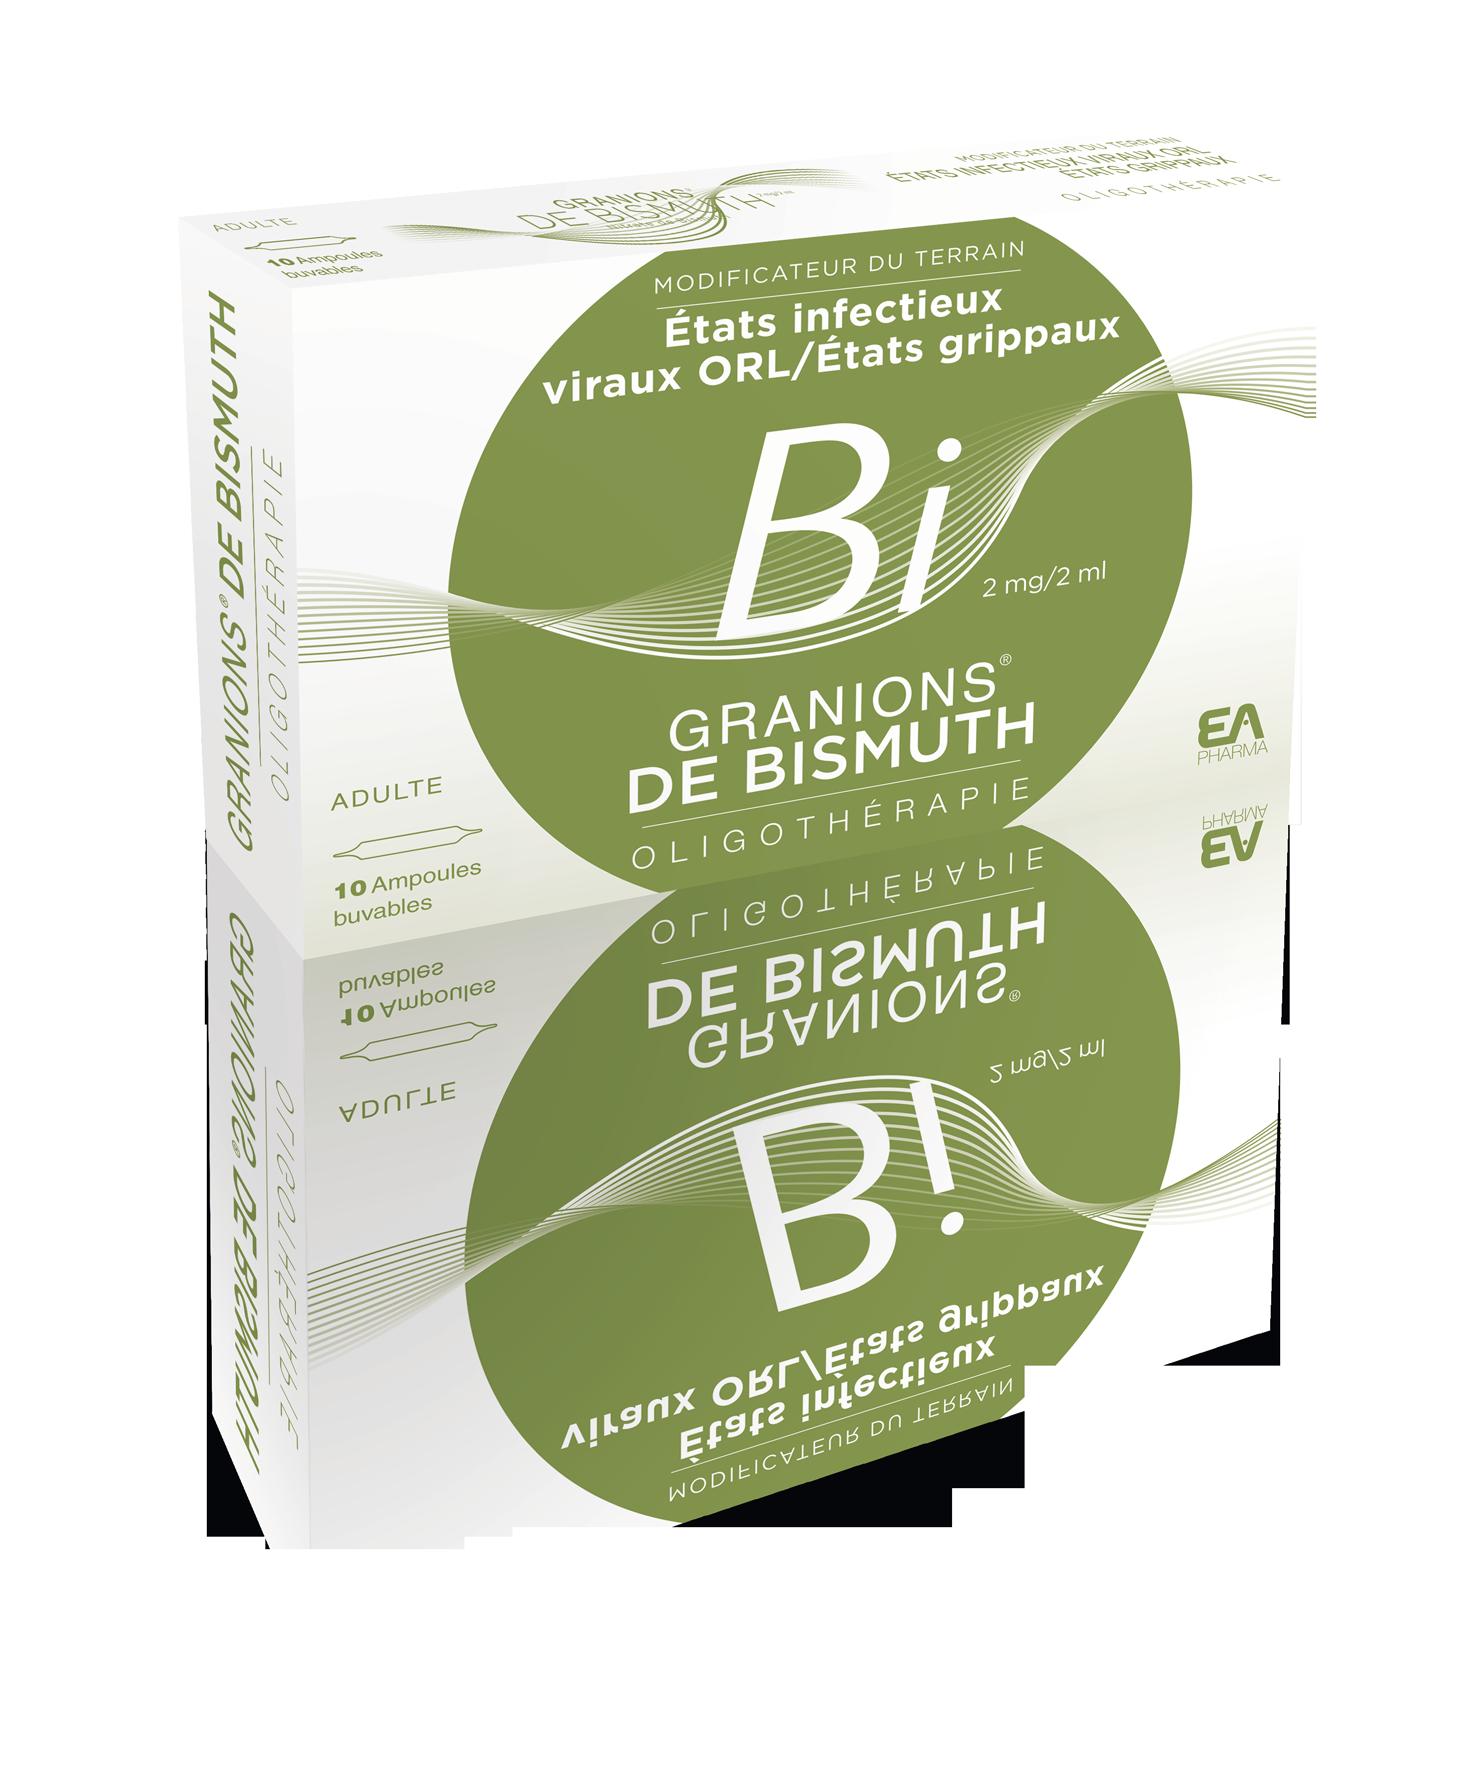 Image GRANIONS DE BISMUTH 2 mg/2 ml S buv 10Amp/2ml